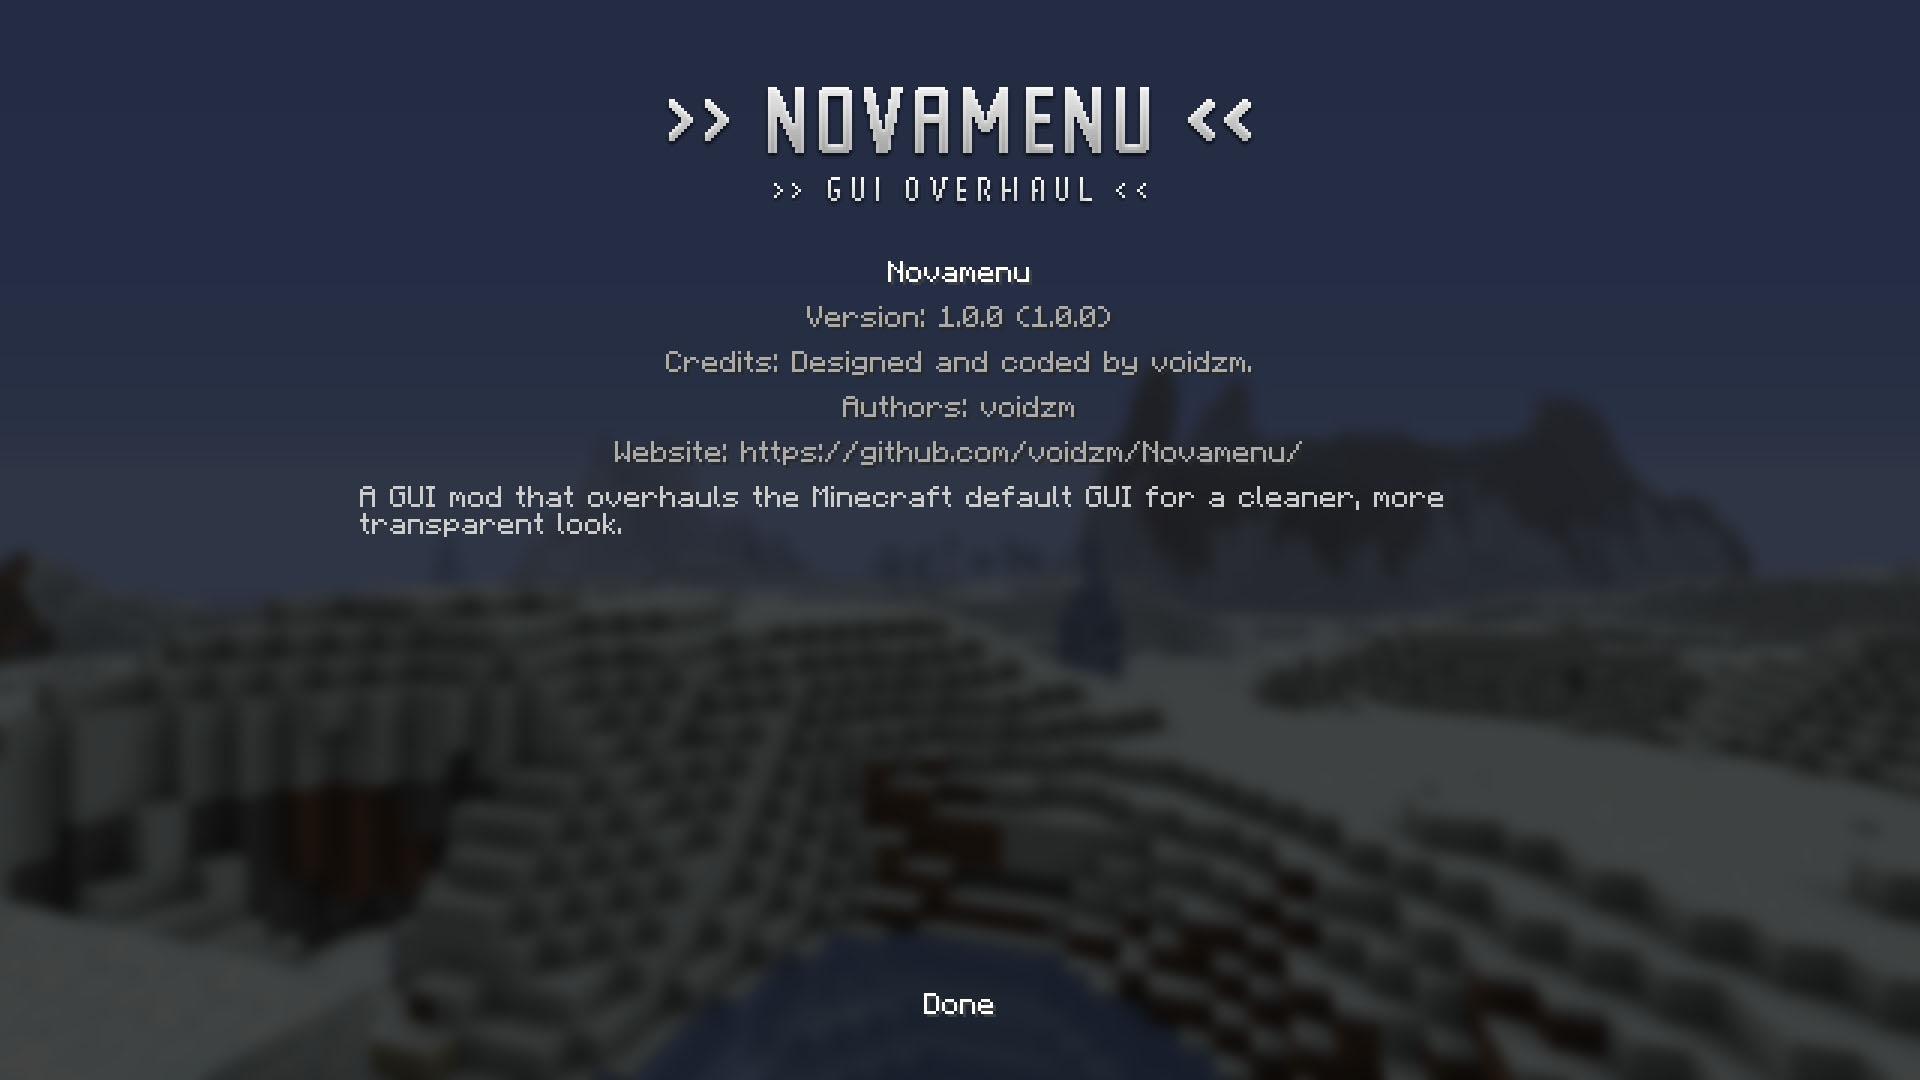 http://minecraft-forum.net/wp-content/uploads/2013/06/eb9ef__Novamenu-Mod-2.jpg